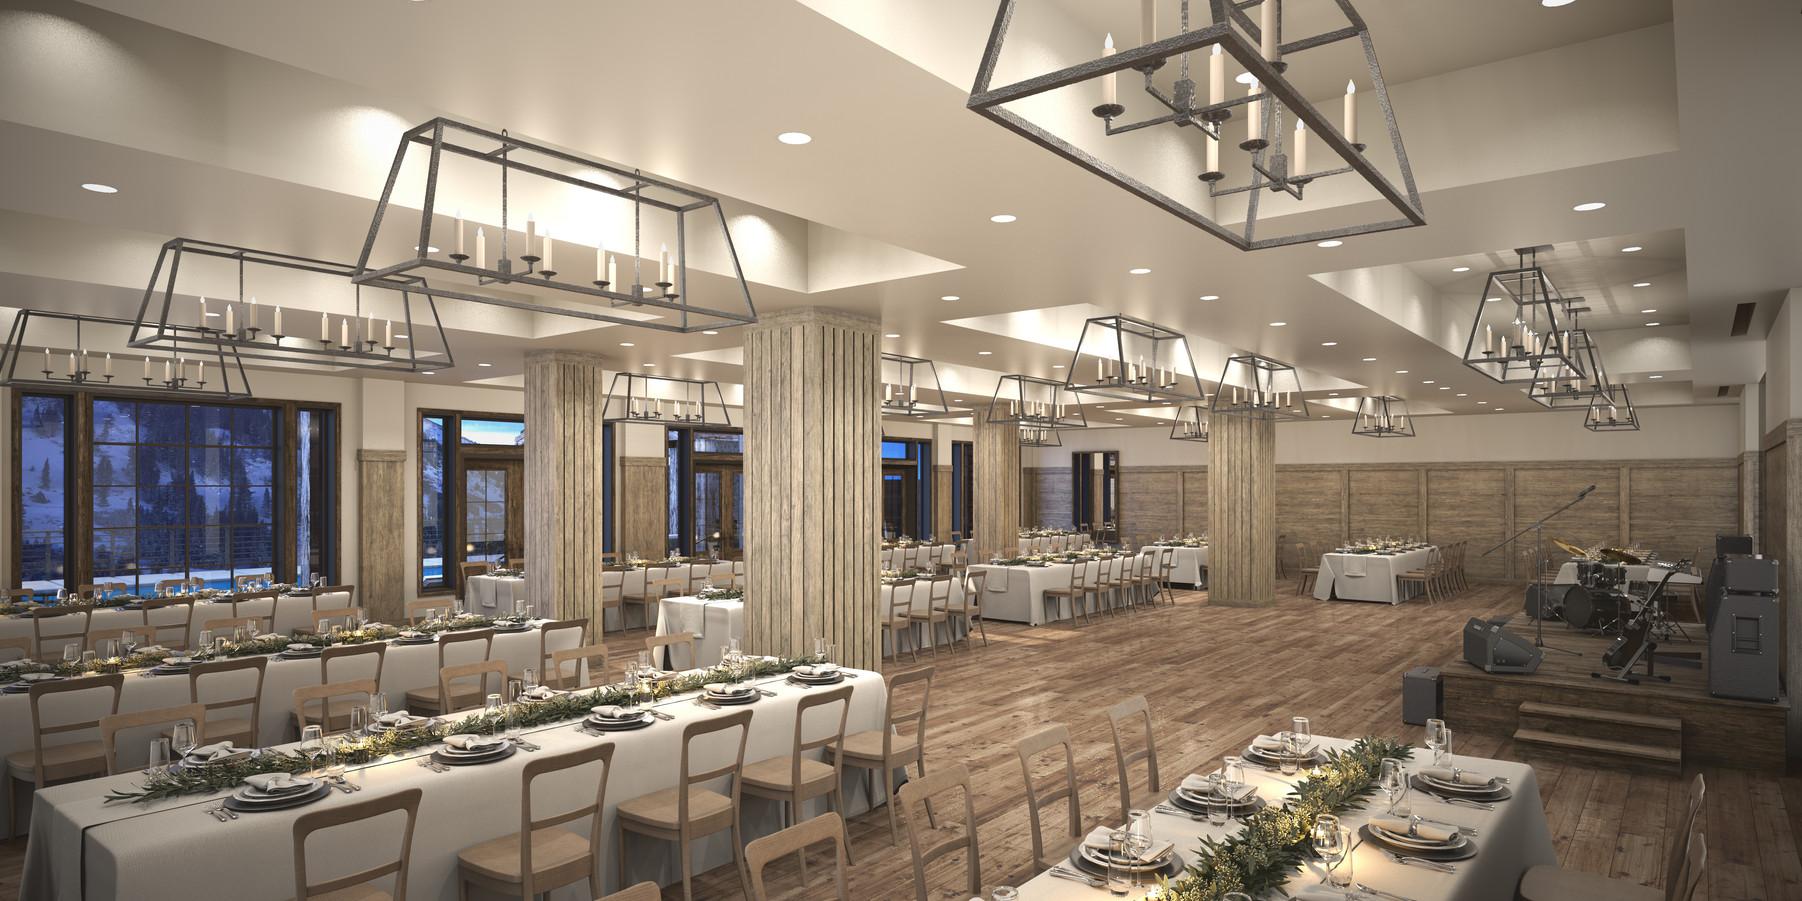 The Snowpine Lodge Ballroom